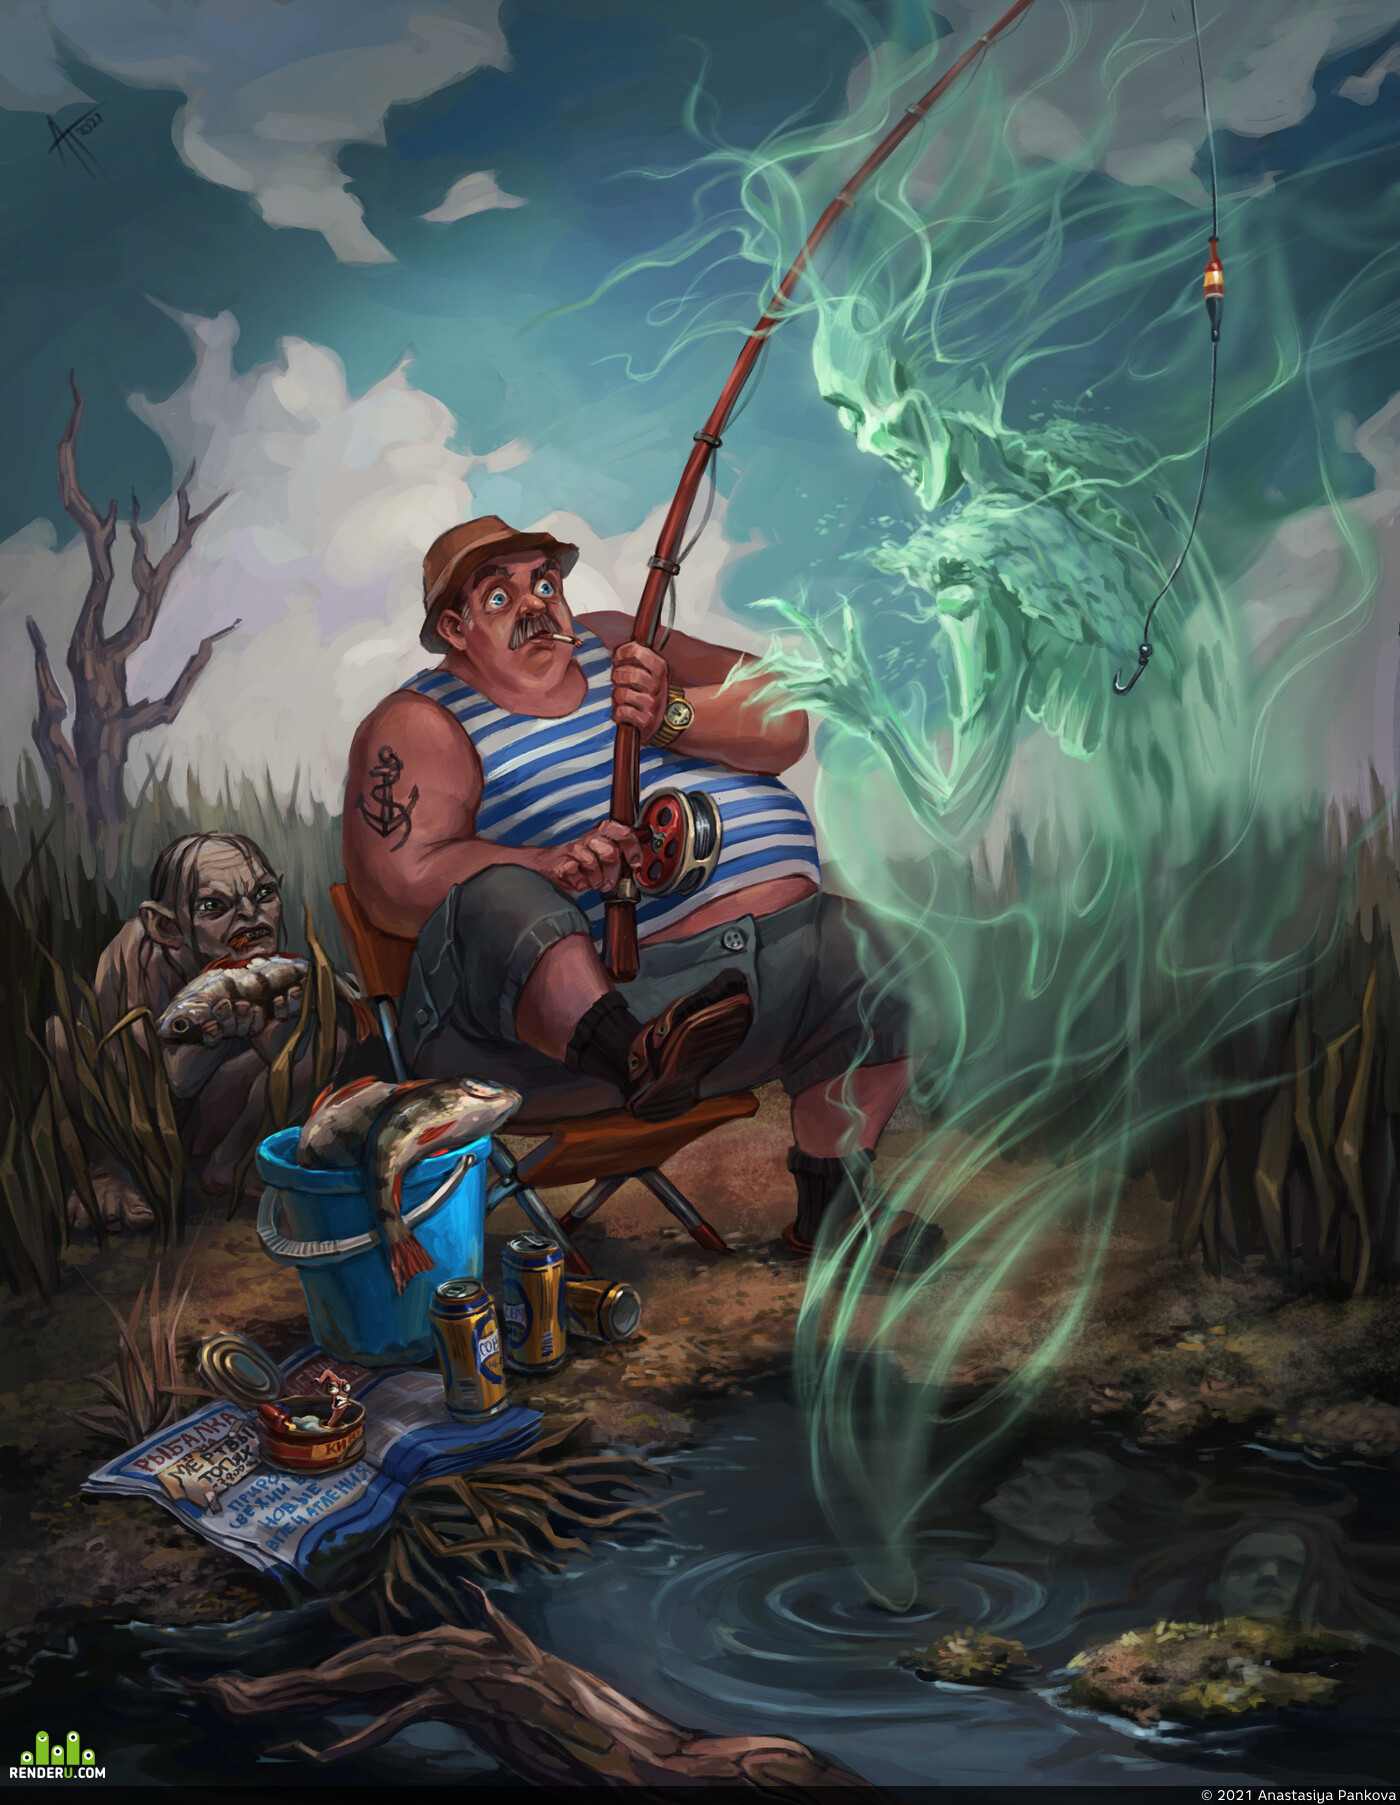 толкиен, Властелин колец, фанарт, Голлум, рыбак, рыбалка, иллюстрация, 2d